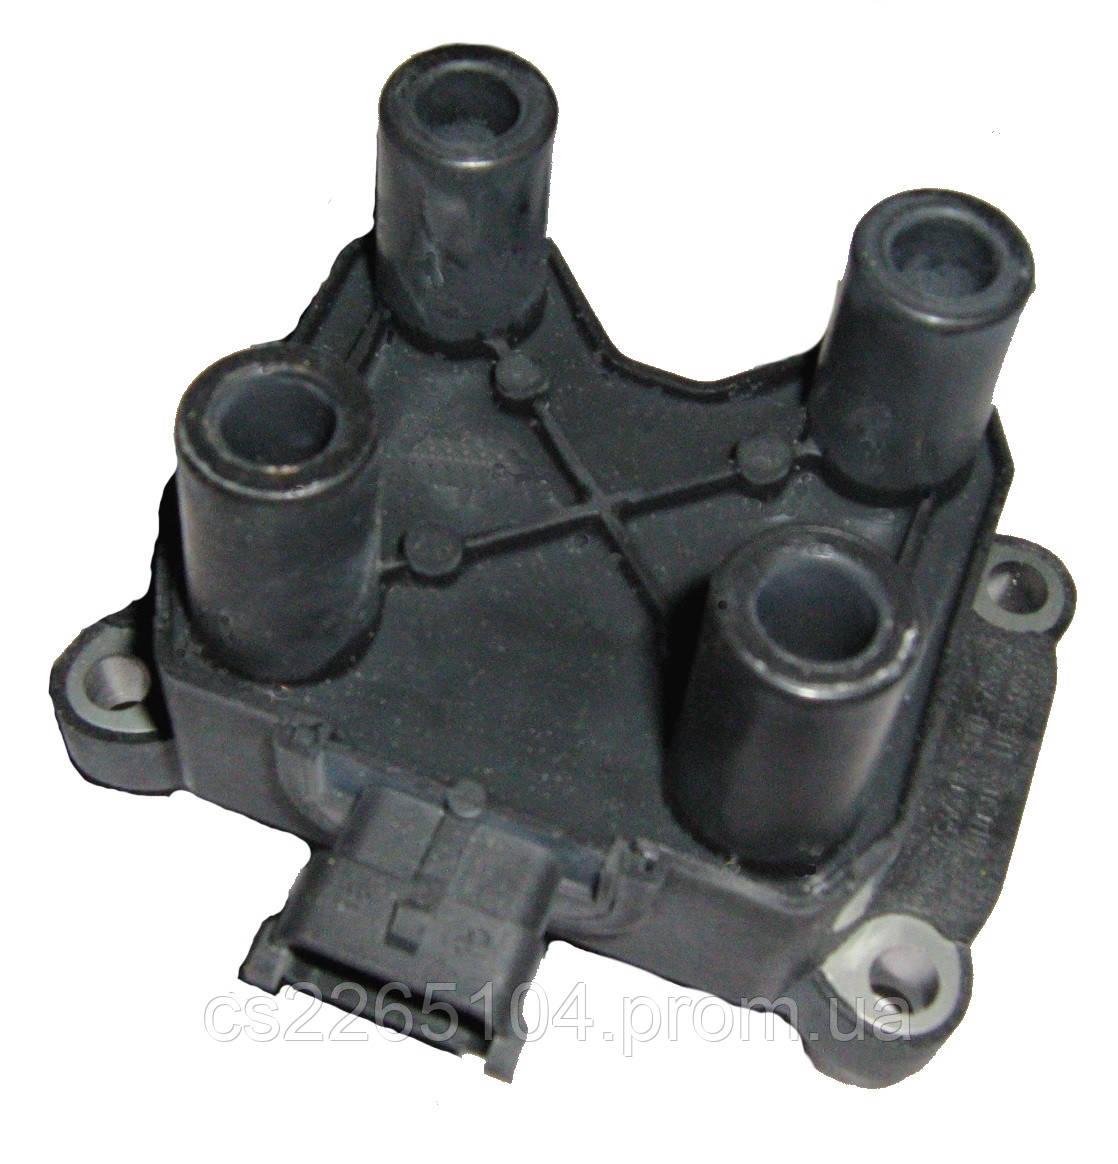 Катушка зажигания (модуль) ВАЗ 2111 инж.8кл.Омега